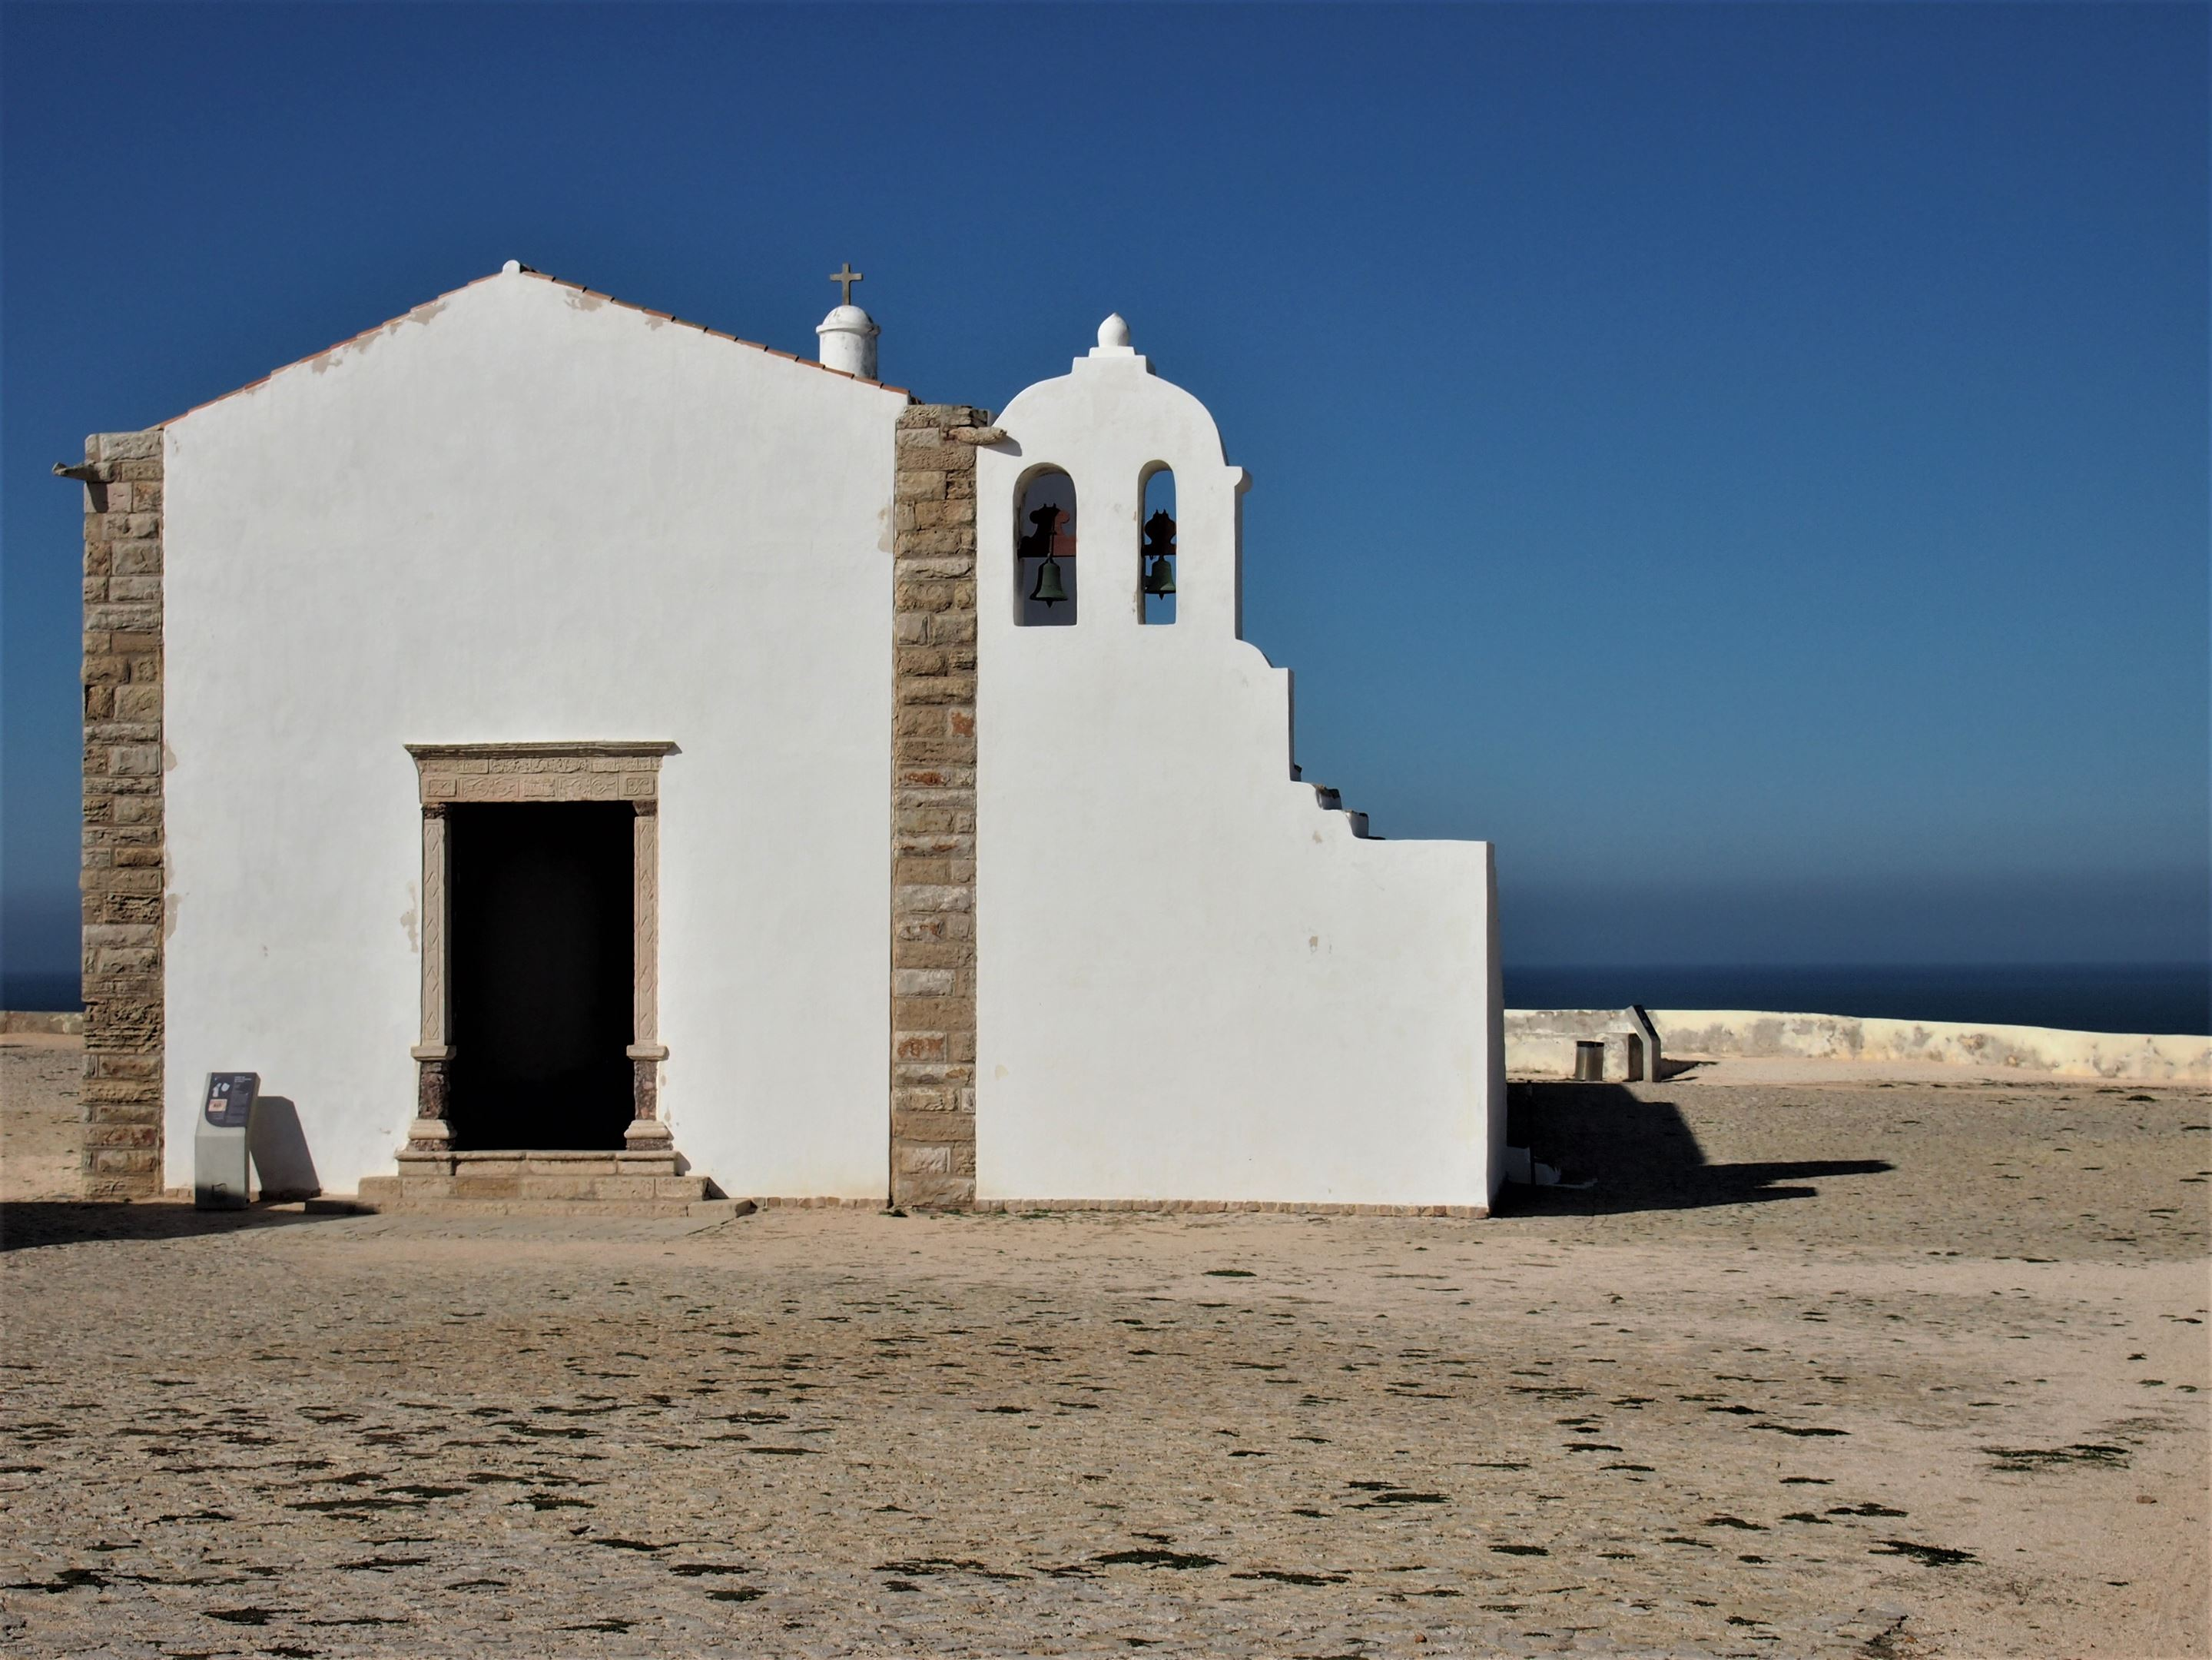 Nossa Senhora da Graça (Church of our Lady of Grace), inside the fort at Sagres, Algarve